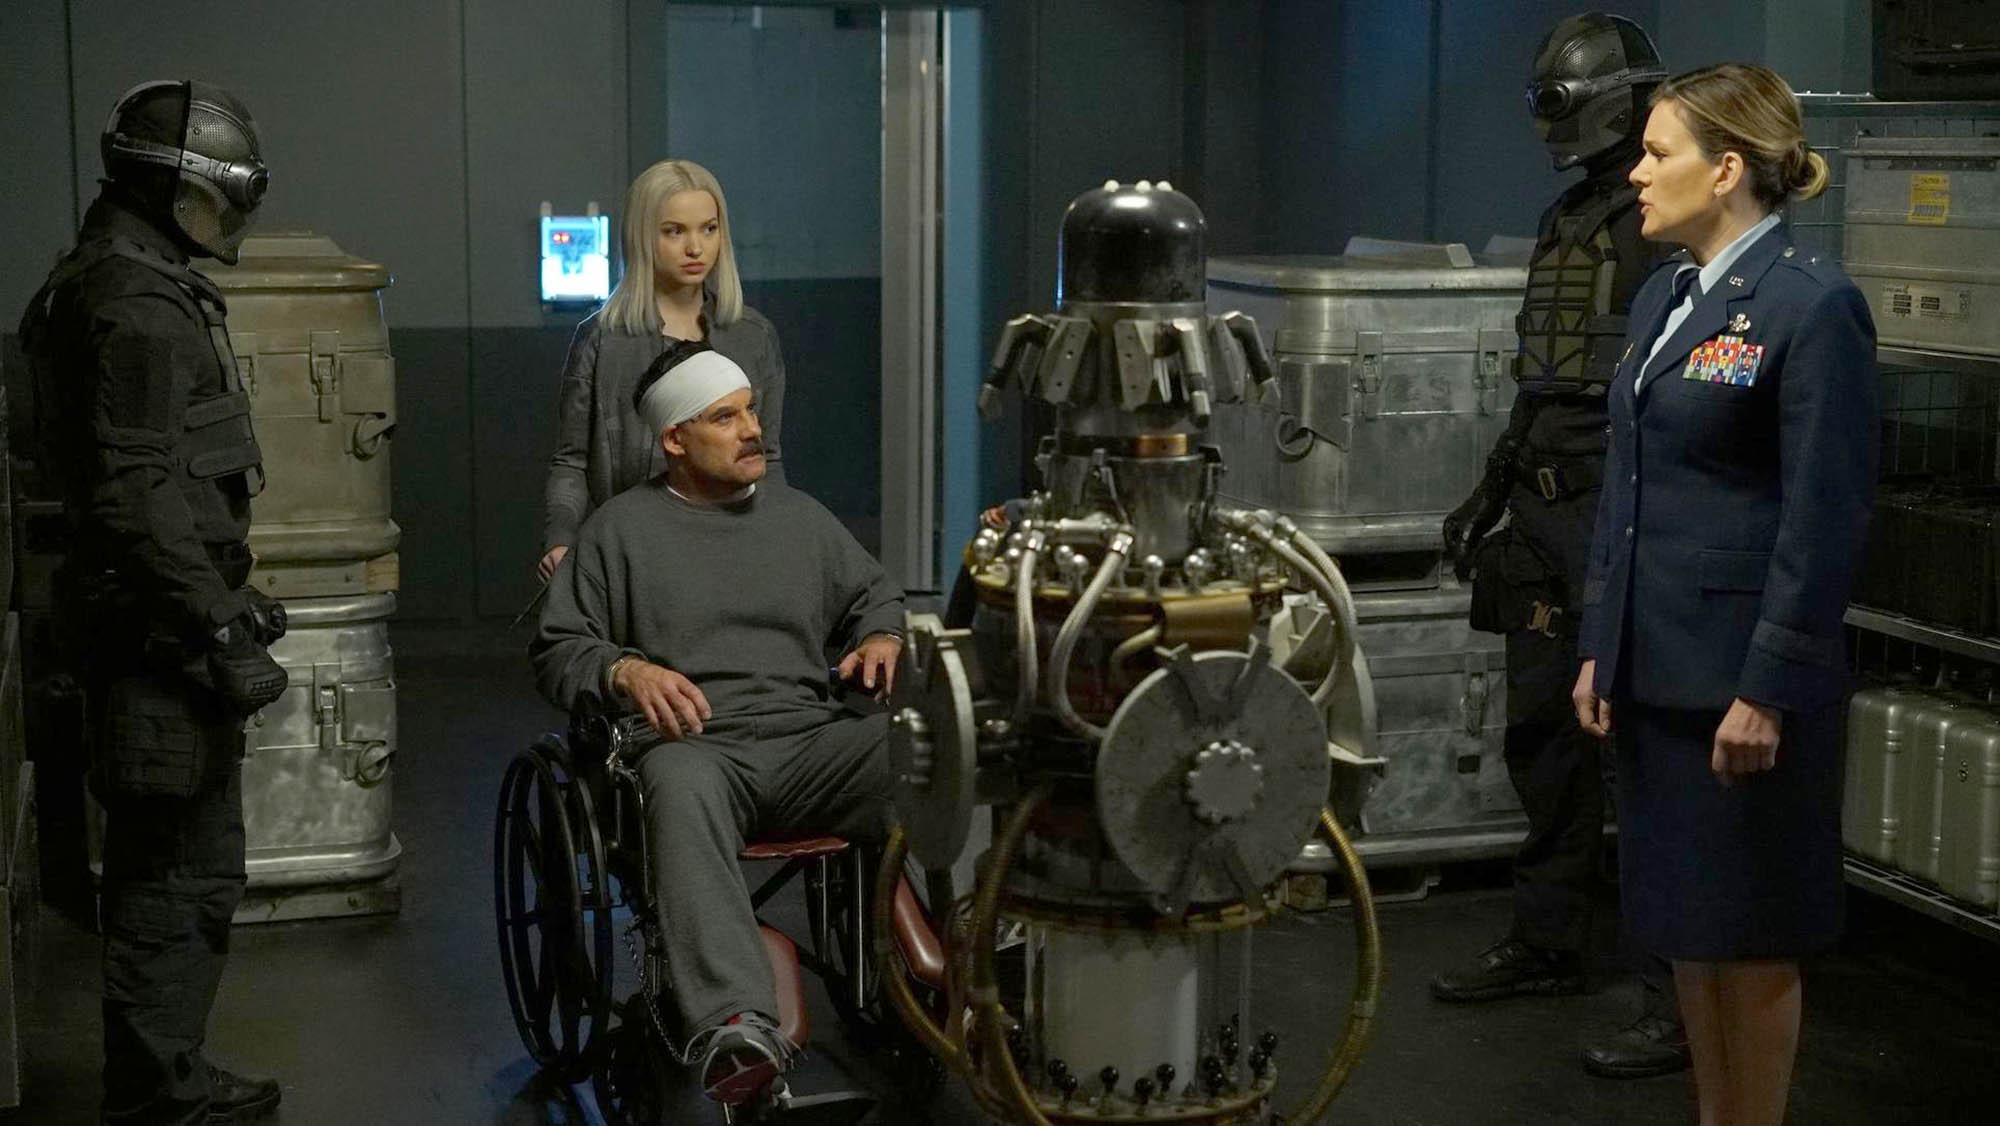 shields05e15a Review: Marvel's Agents of S.H.I.E.L.D. S05E15+E16 - Rise and shine + Inside voices